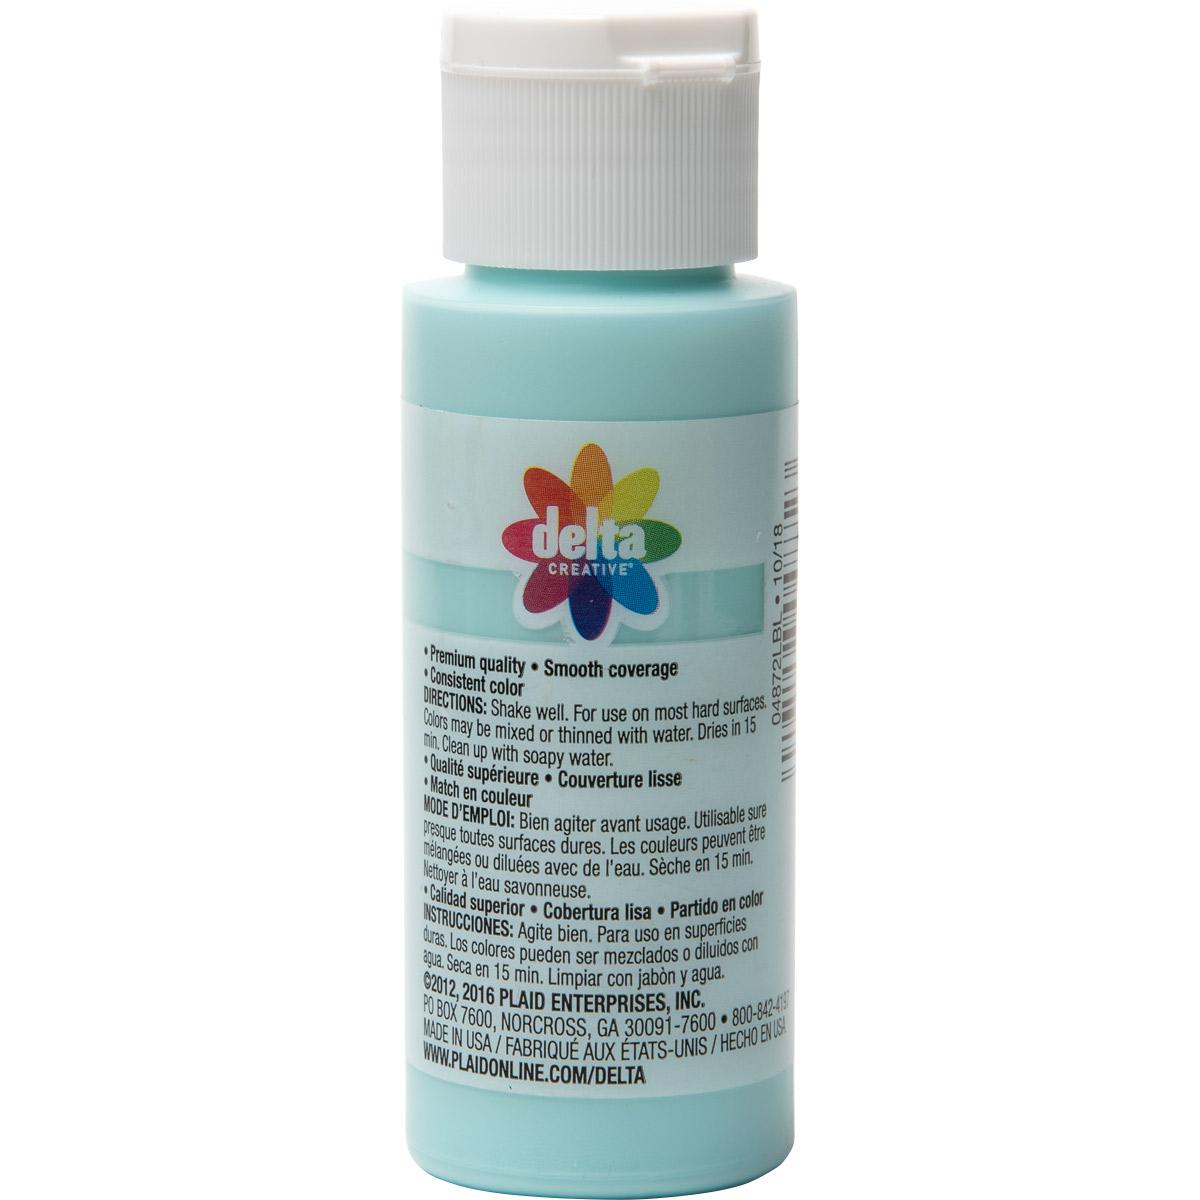 Delta Ceramcoat ® Acrylic Paint - Surfboard, 2 oz.